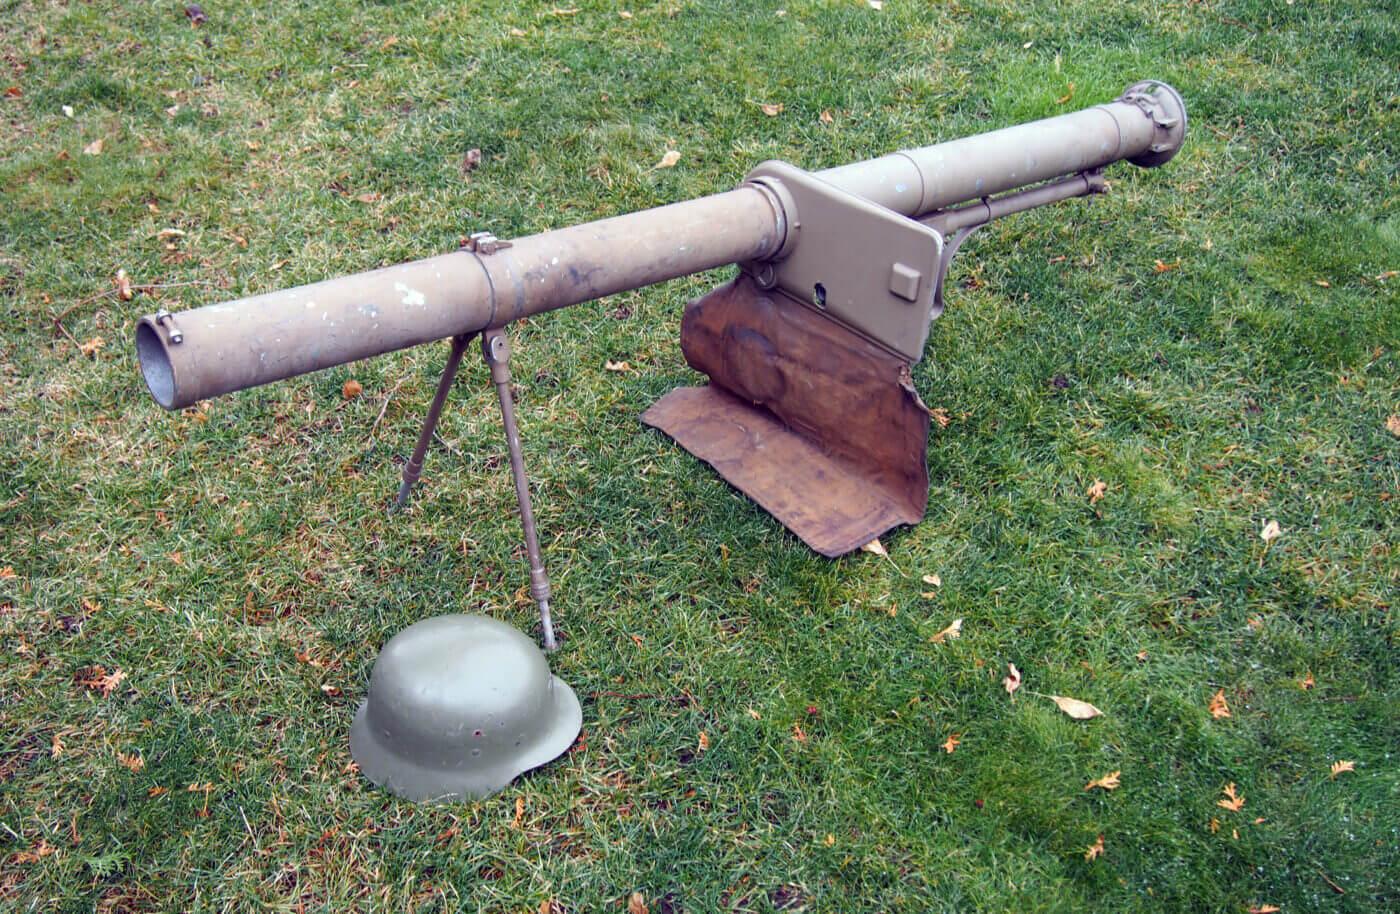 Spanish Instalaza M65 anti-tank launcher